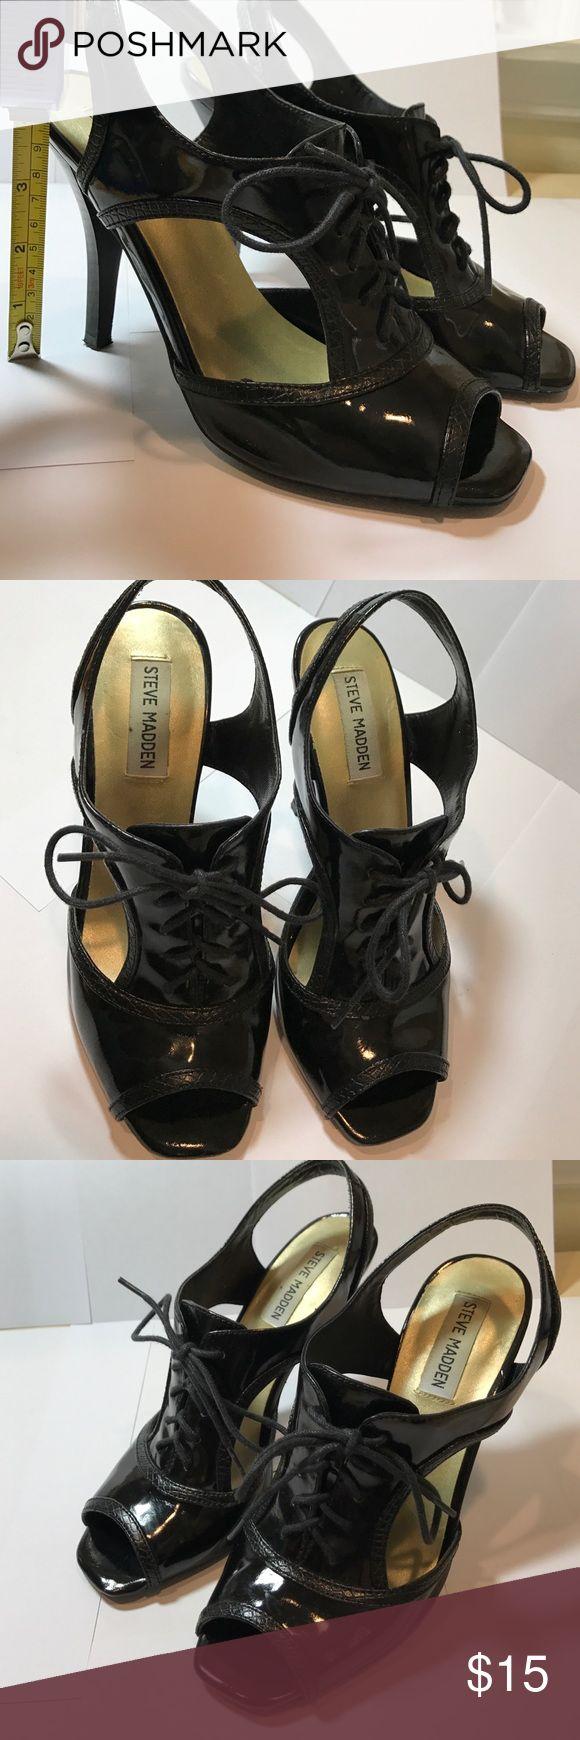 Steve Madden black heels Steve Madden black heels Steve Madden Shoes Heels